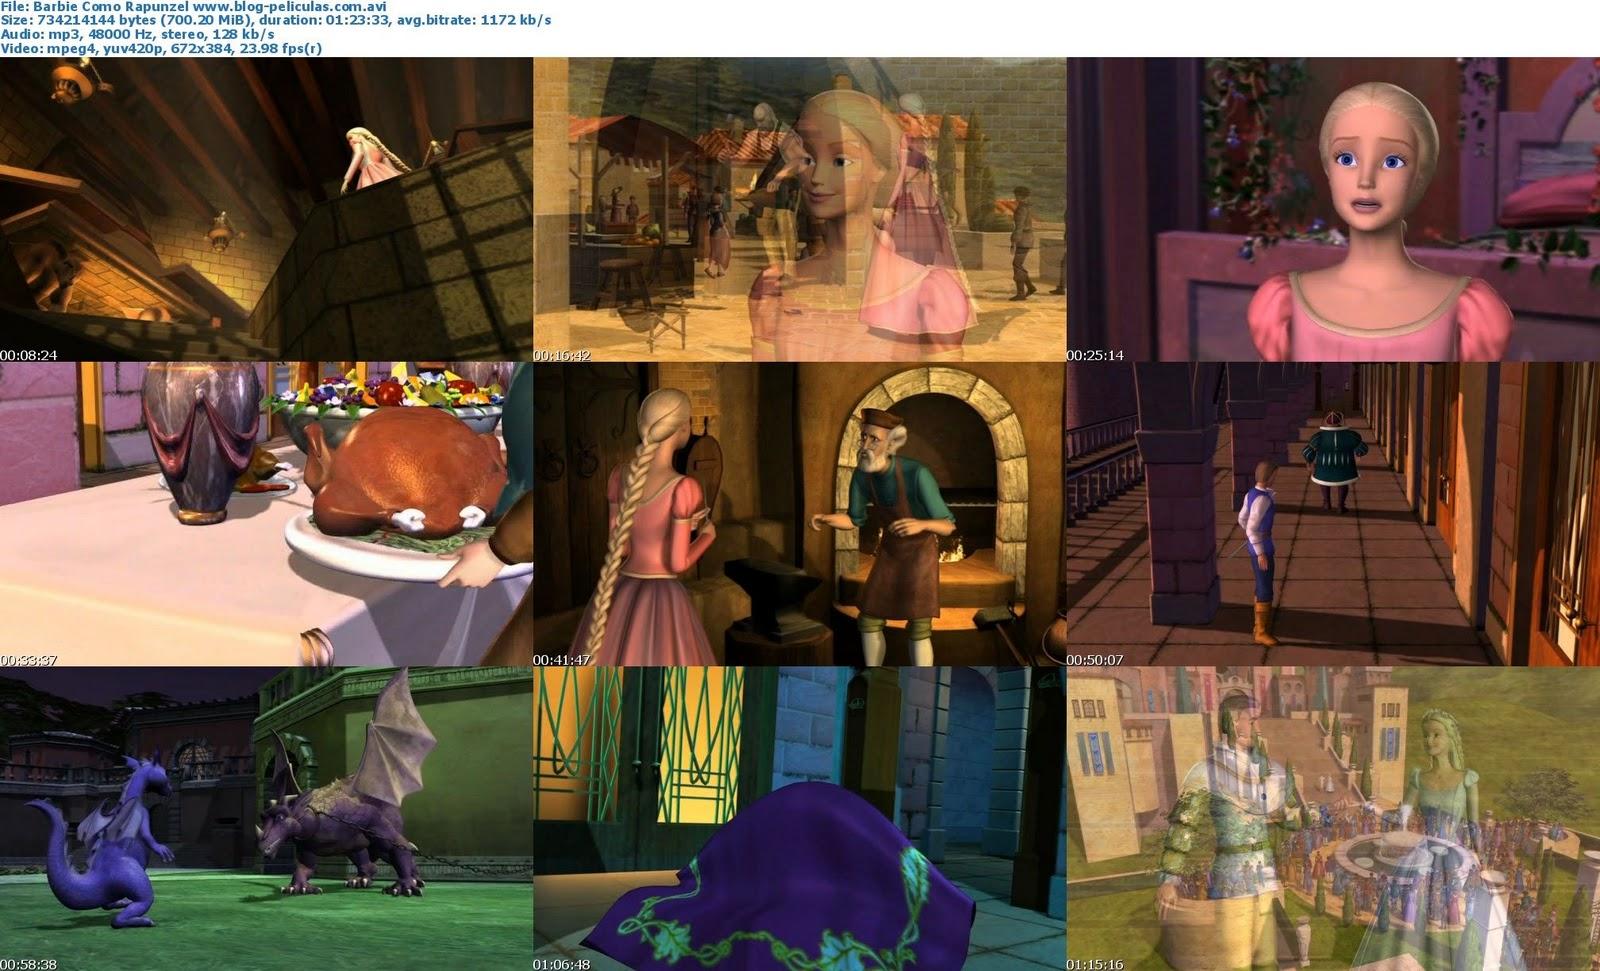 barbie rapunzel castellano online dating